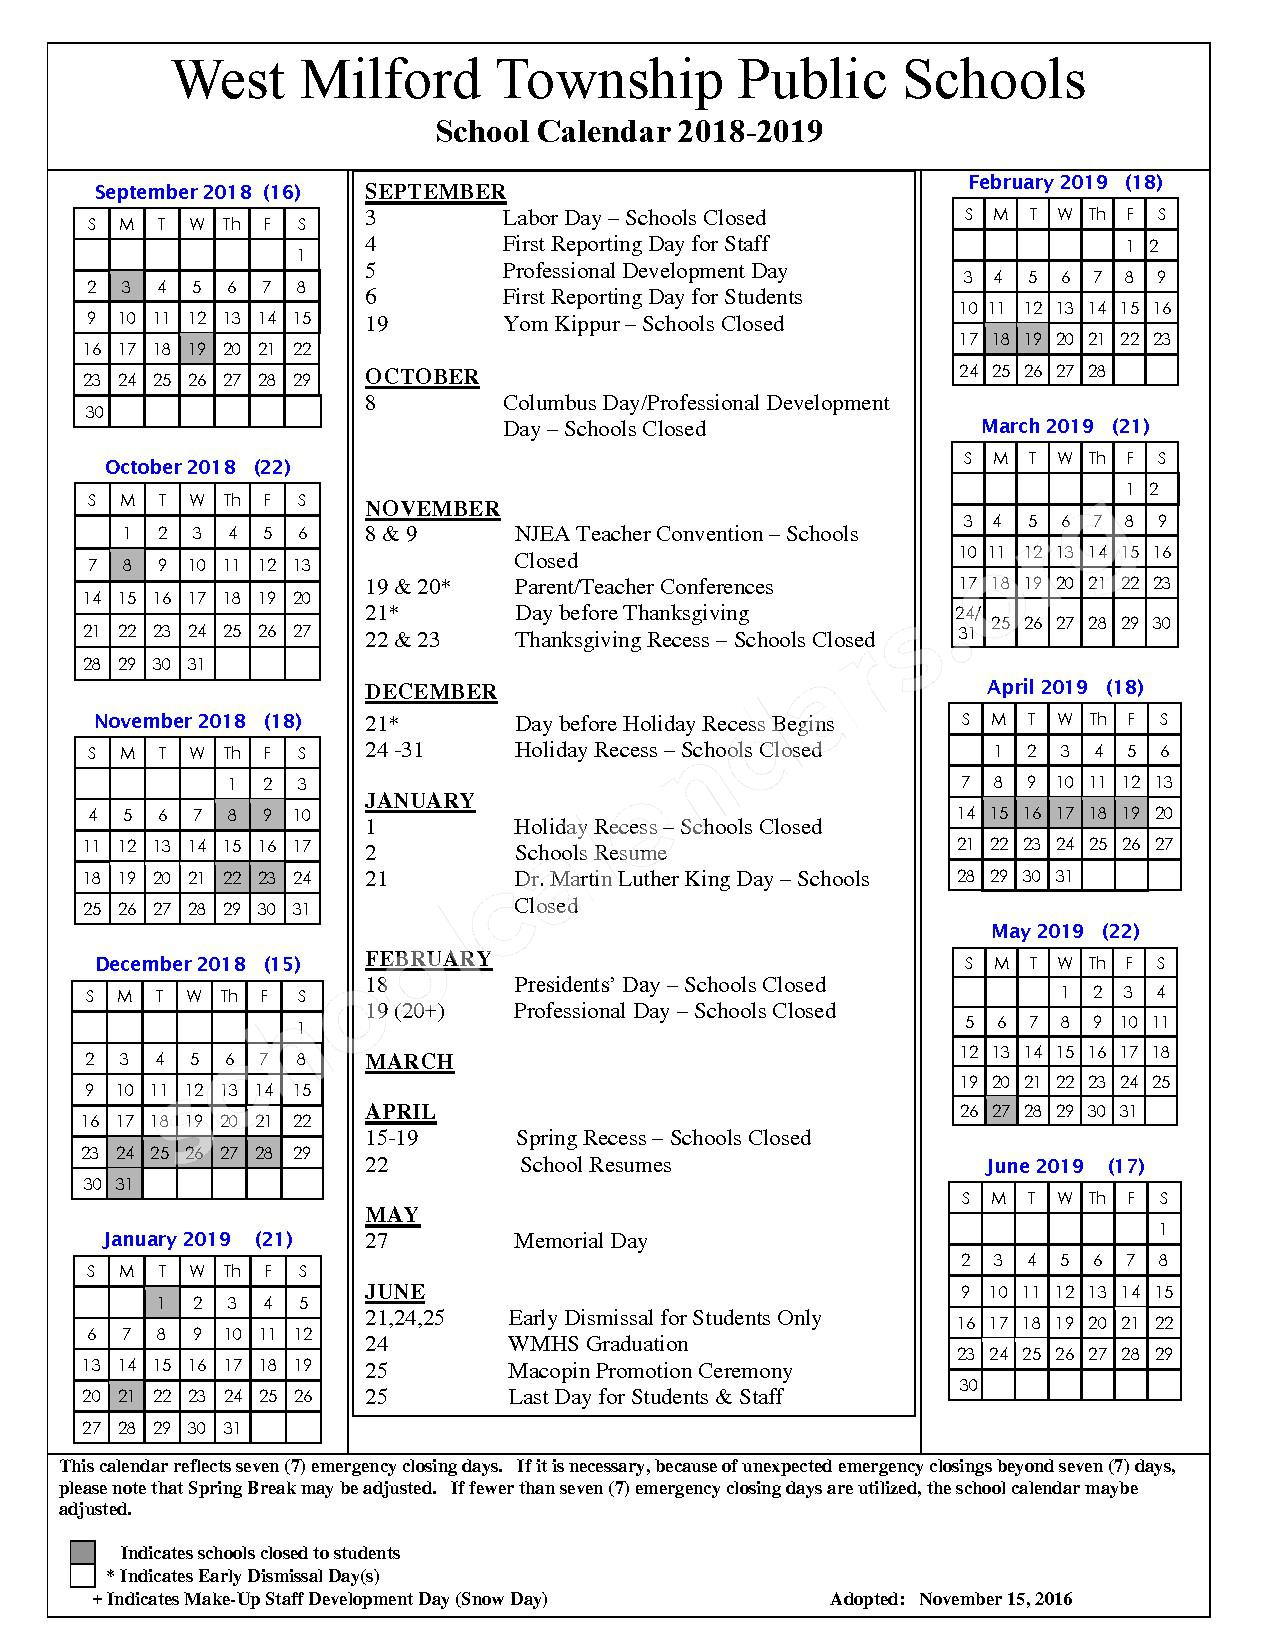 2018 - 2019 School Calendar – West Milford Township Public Schools – page 1